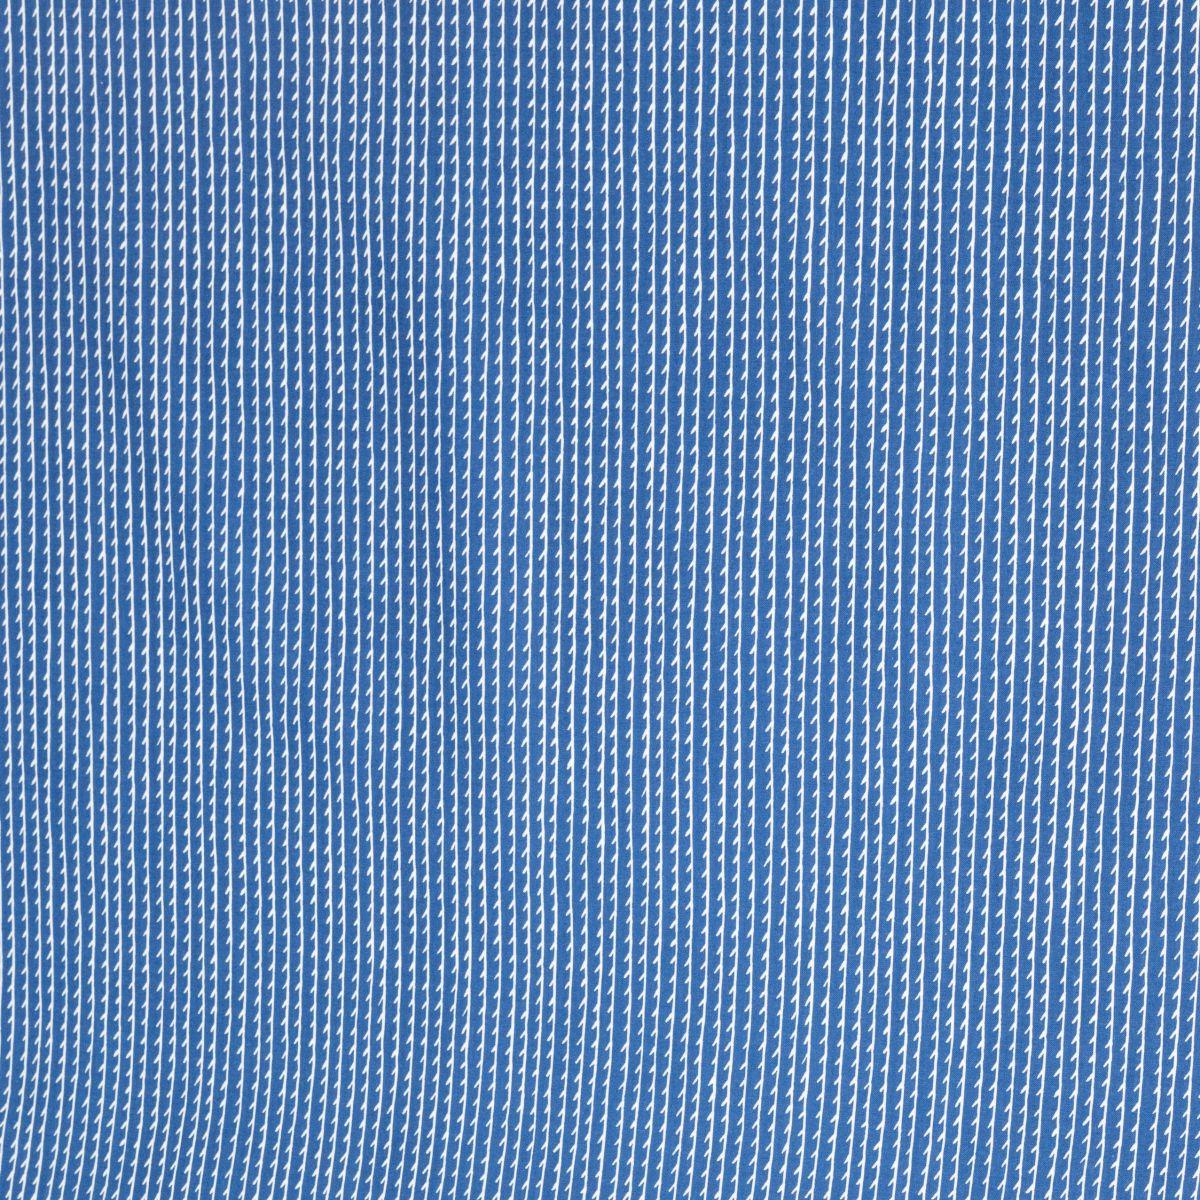 artek-collection-image-rivi-fabric_WEB